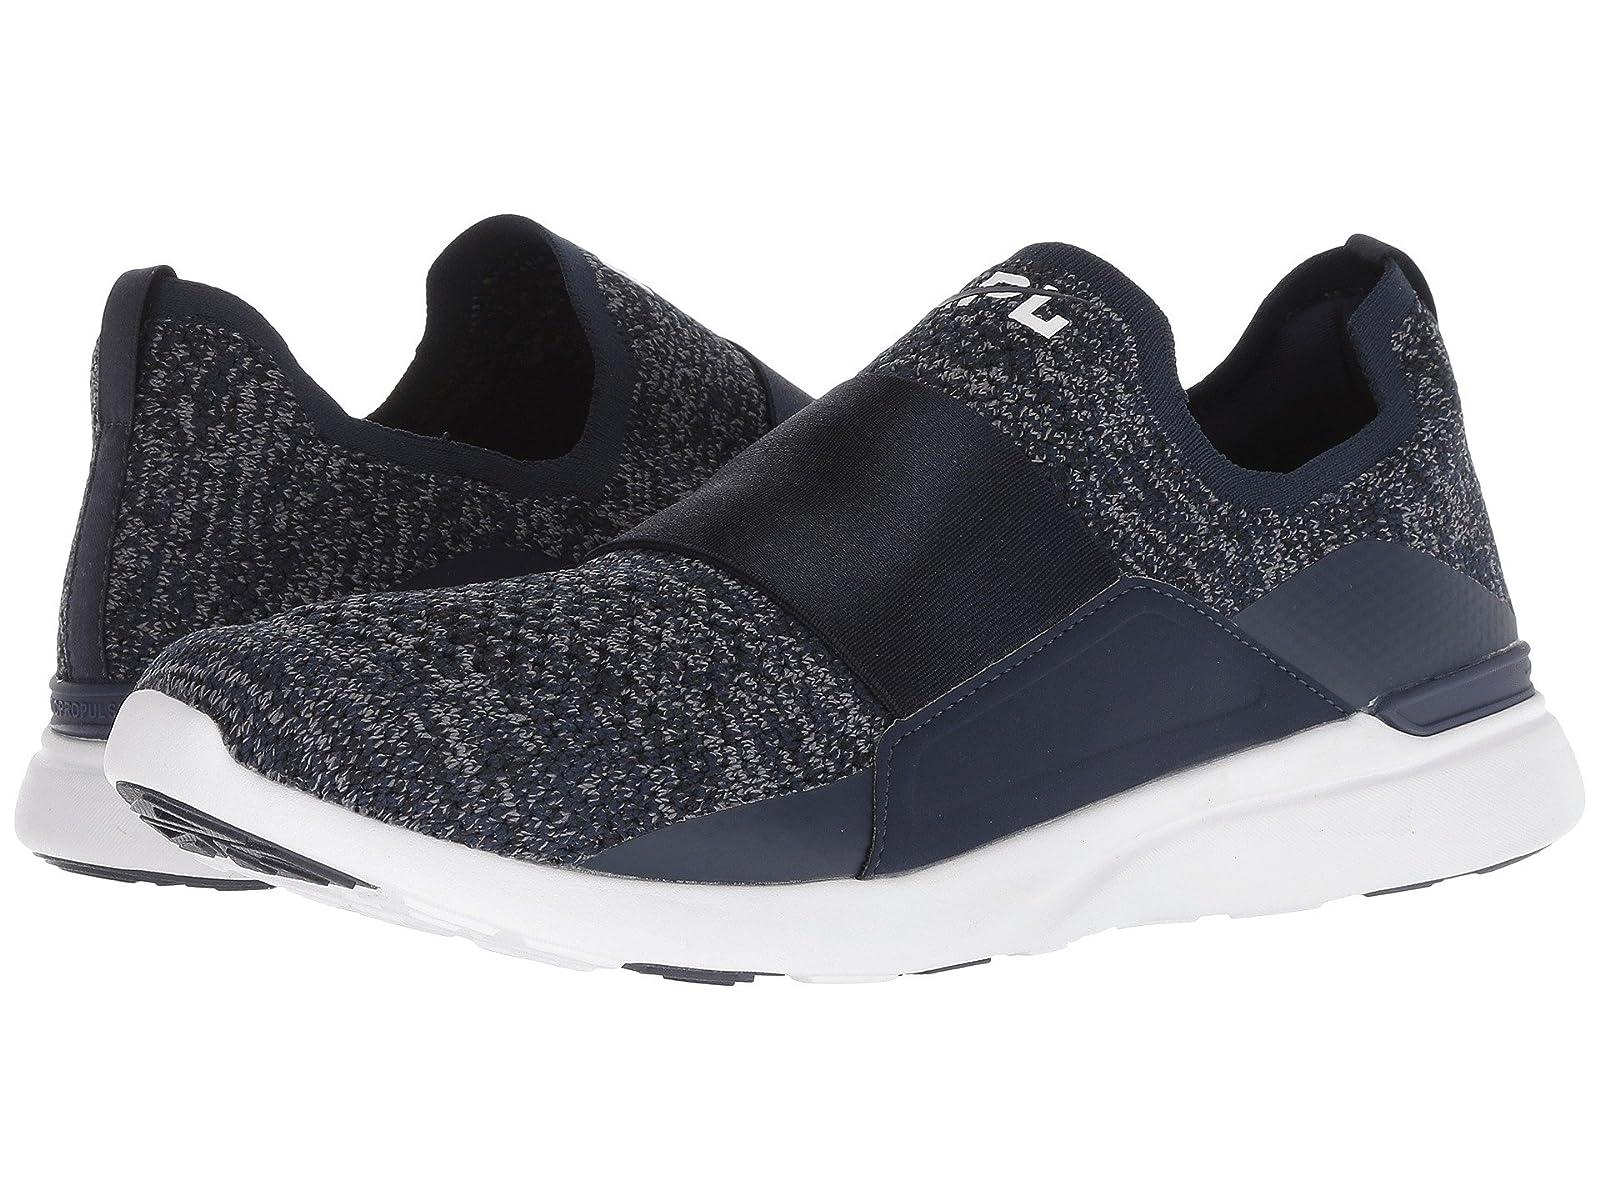 Athletic Propulsion Labs (APL) Techloom BlissAtmospheric grades have affordable shoes